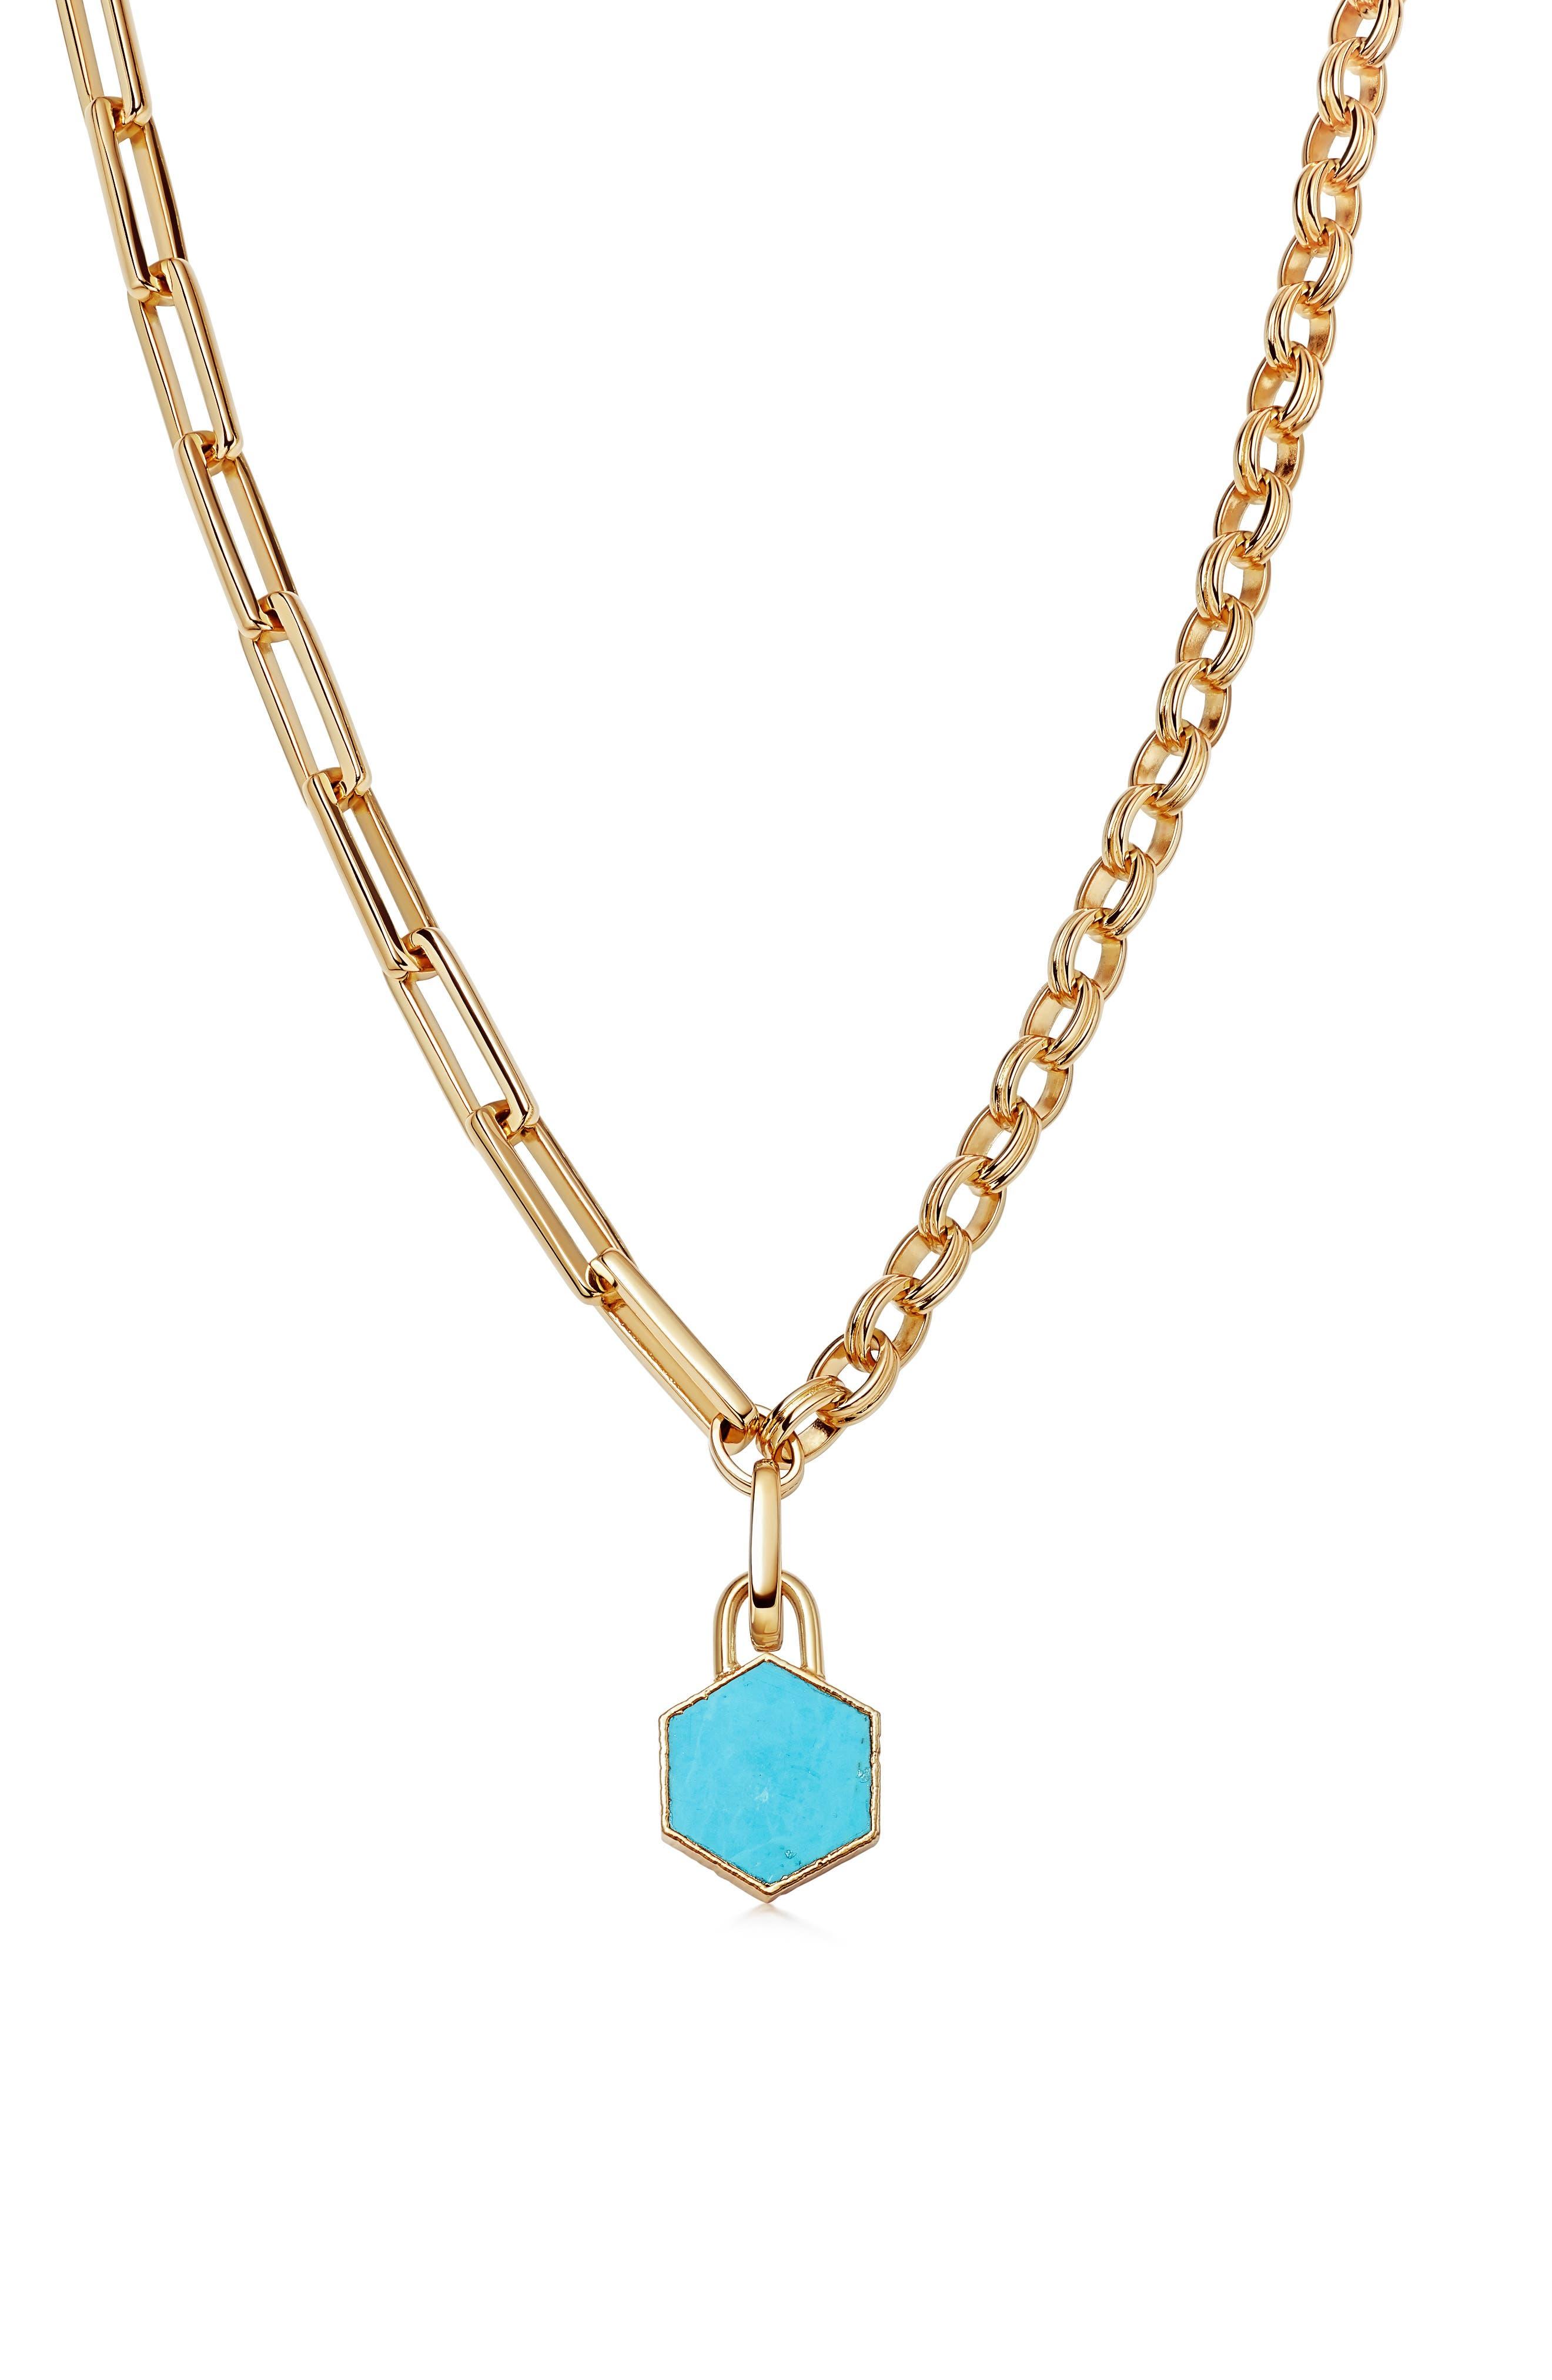 Imitation Turquoise Pendant Mixed Link Necklace